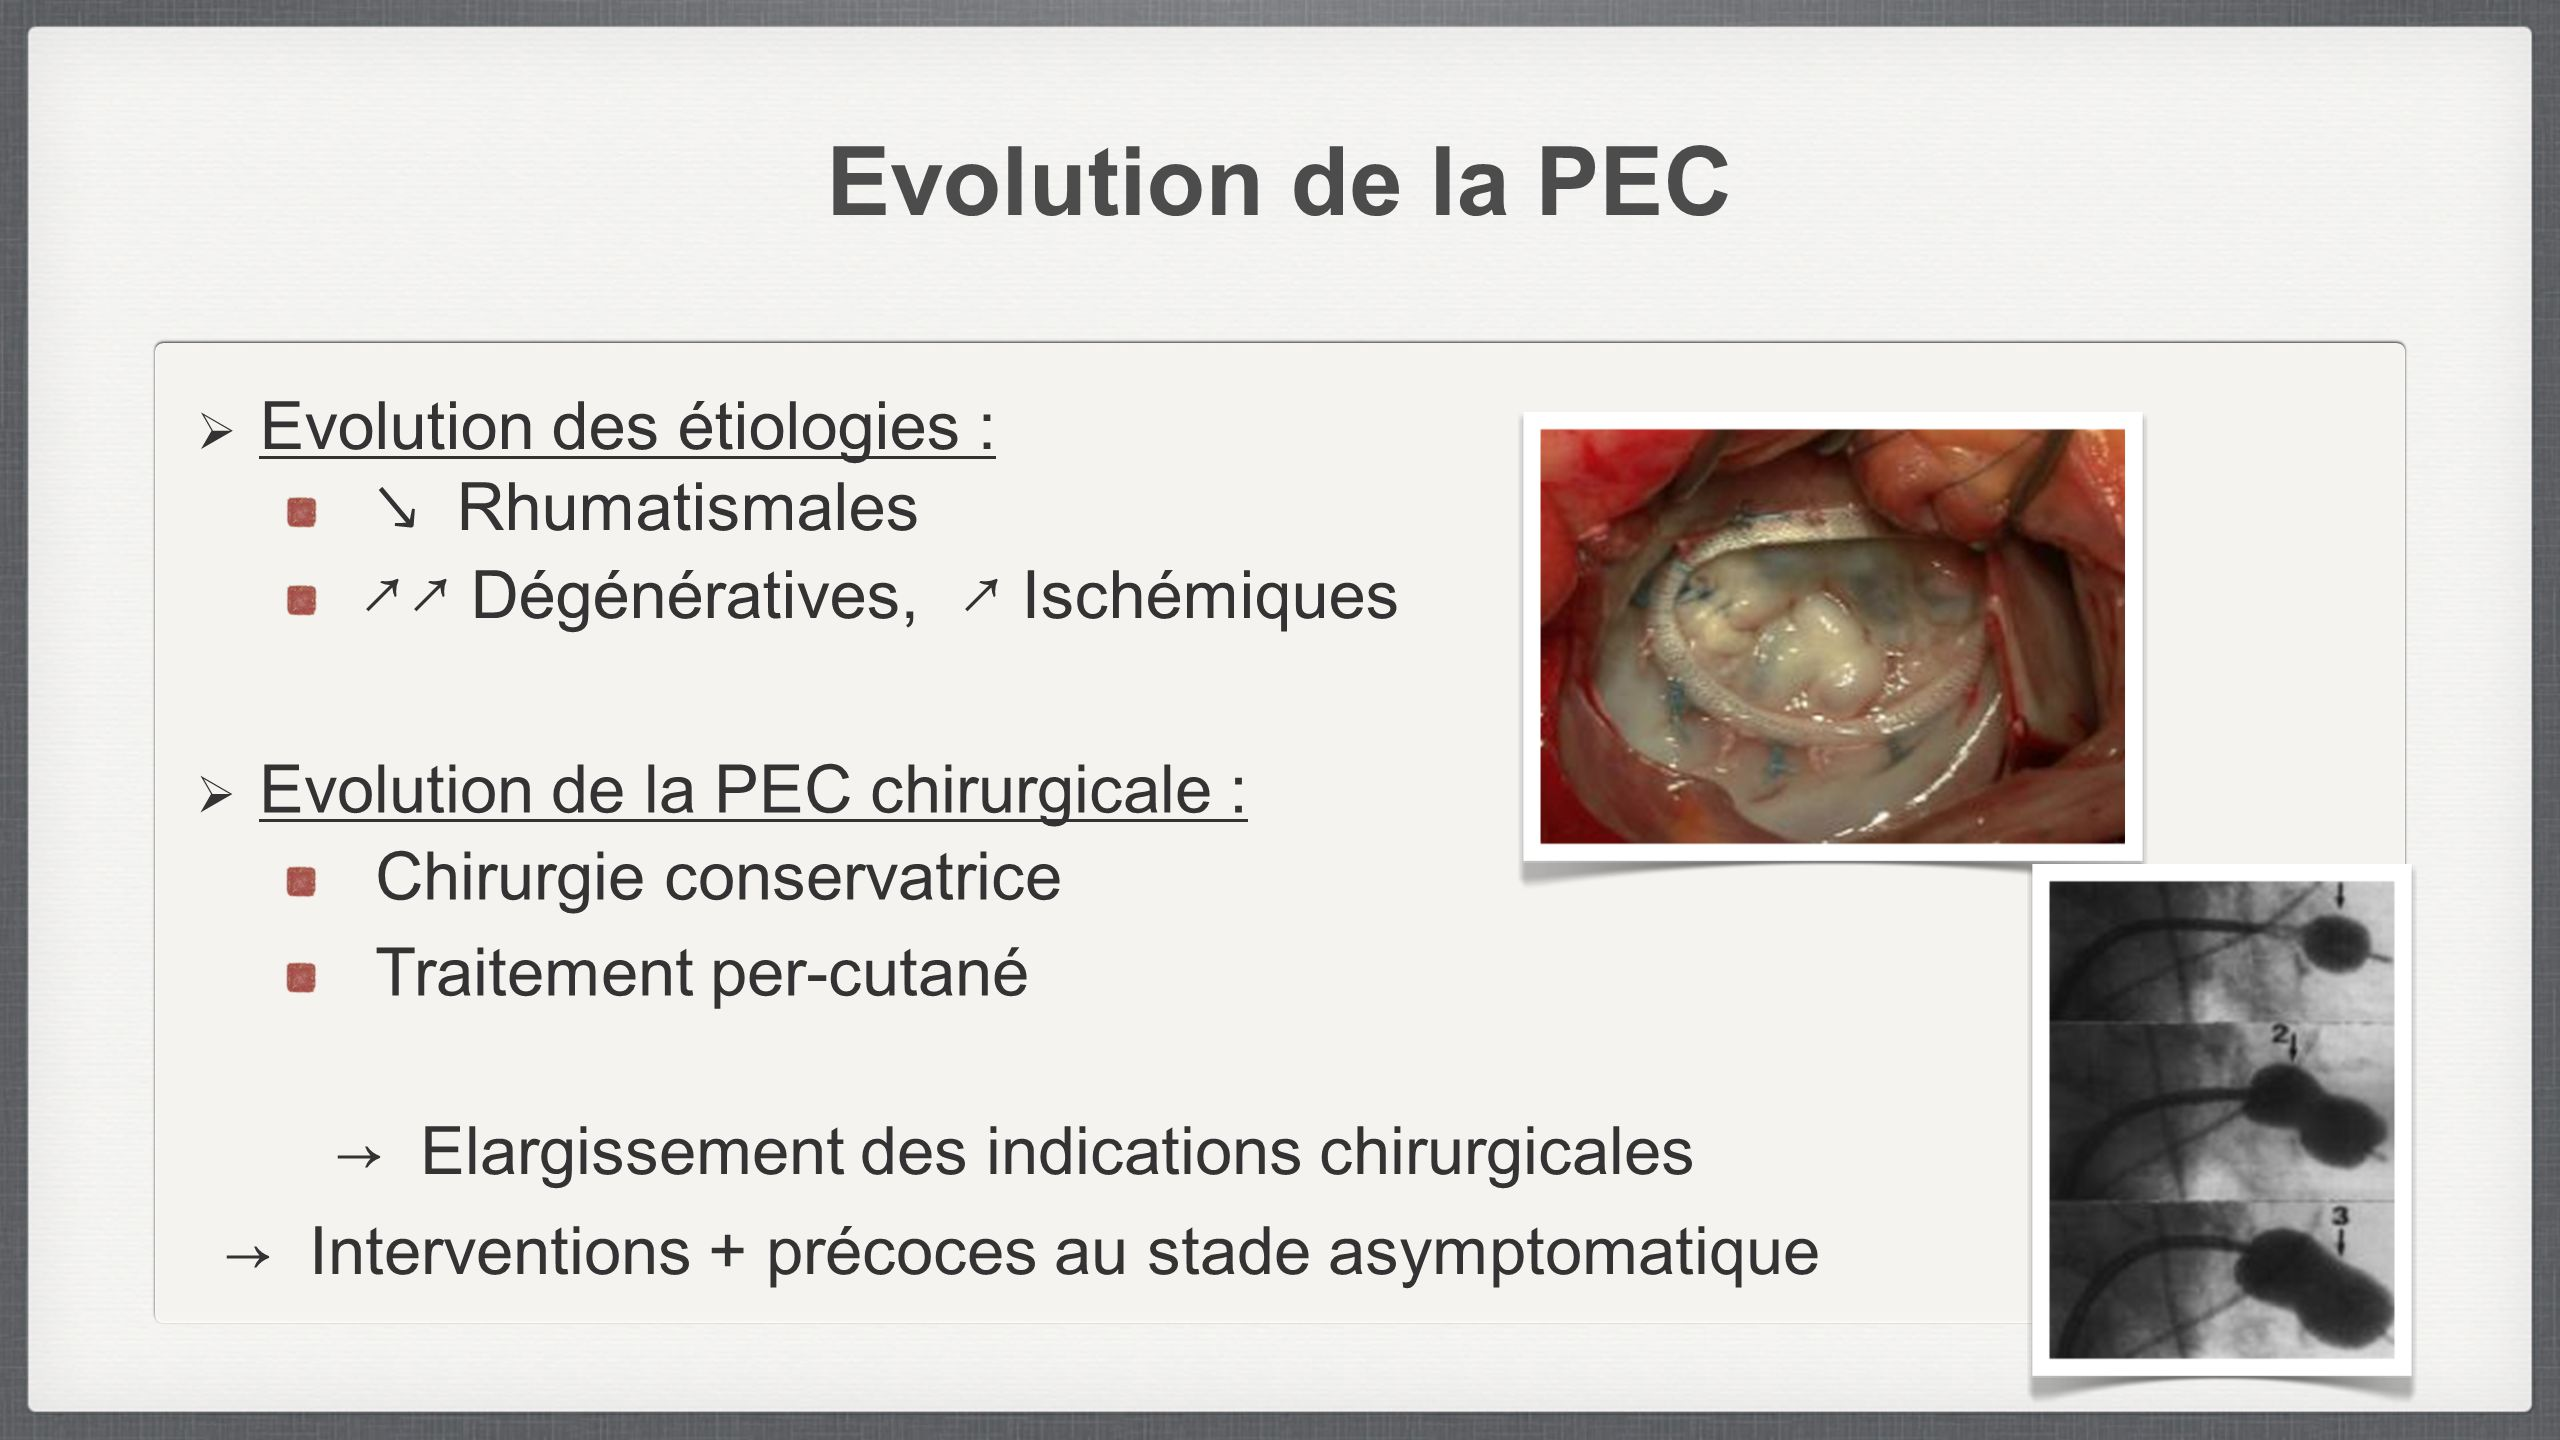 Evolution de la PEC Evolution des étiologies : ↘ Rhumatismales